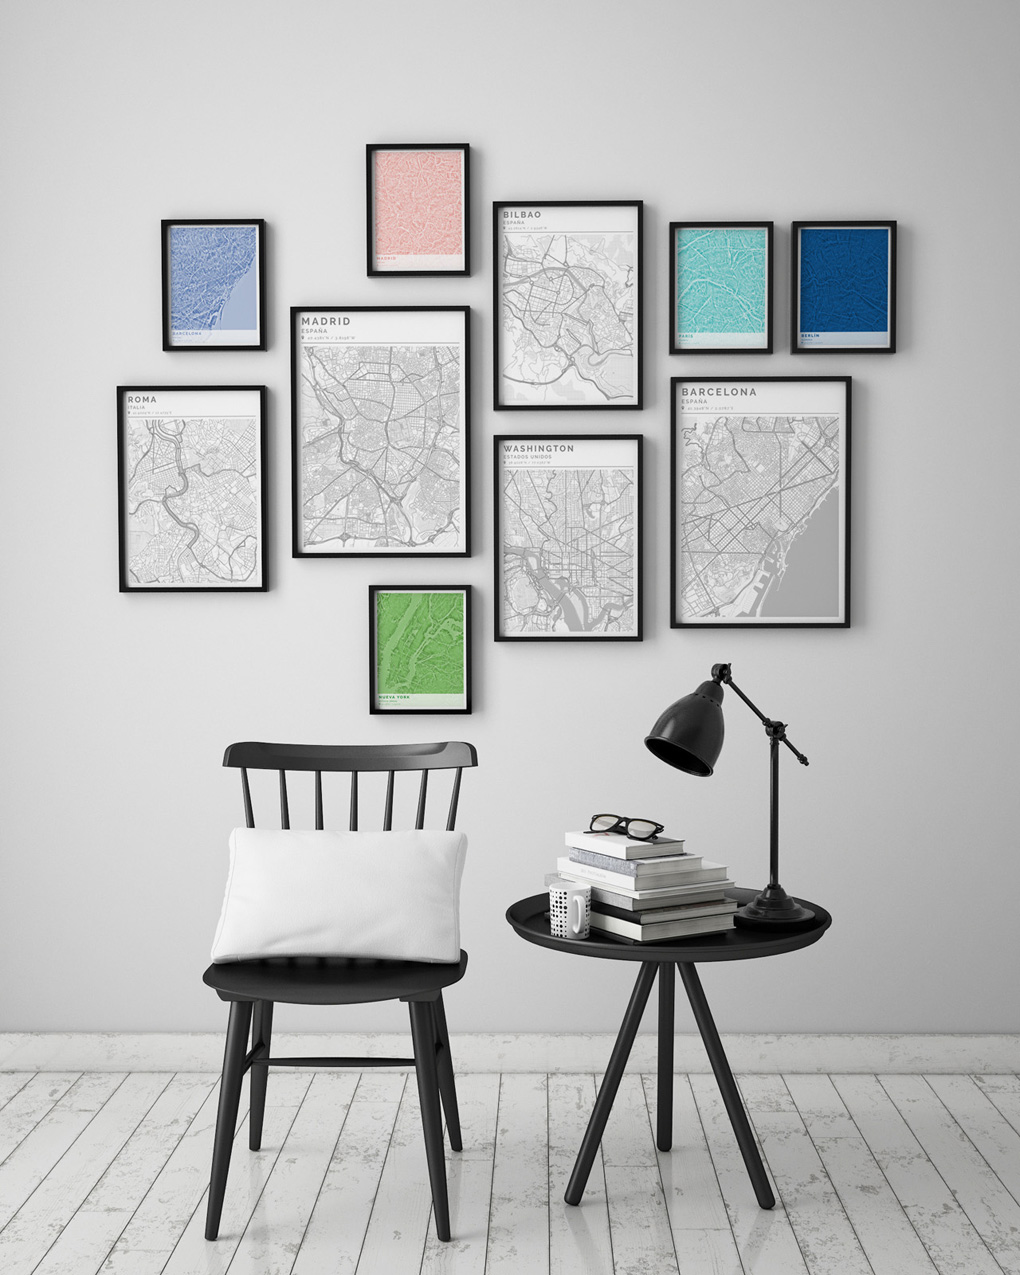 Composición de cuadros con mapas formando un collage